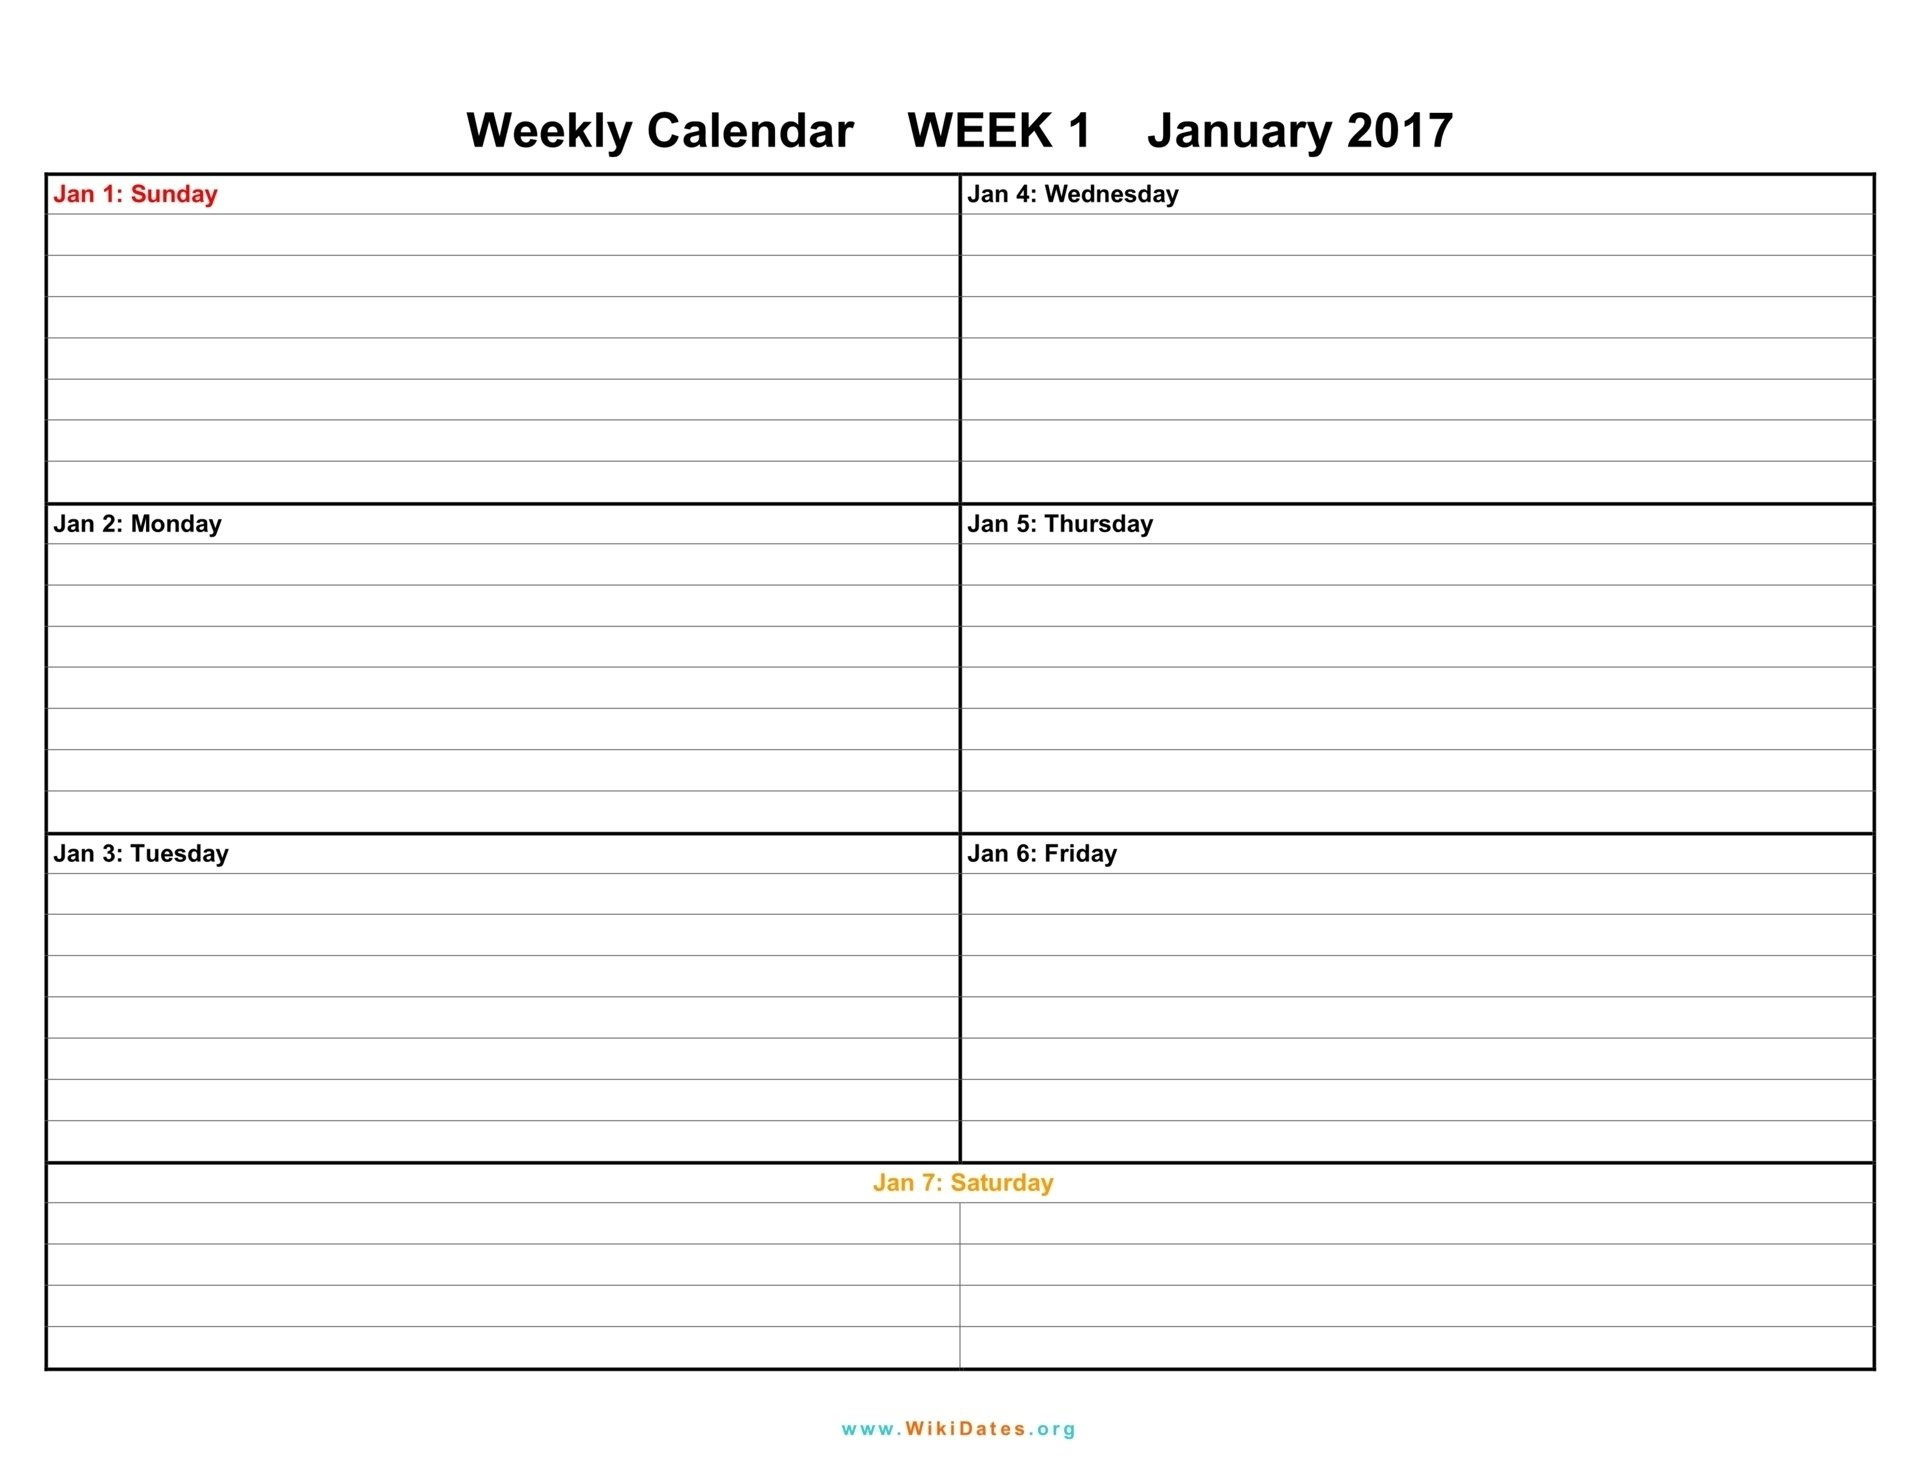 1 Week Vacation Calendar Printable - Template Calendar Design A One Week Calander